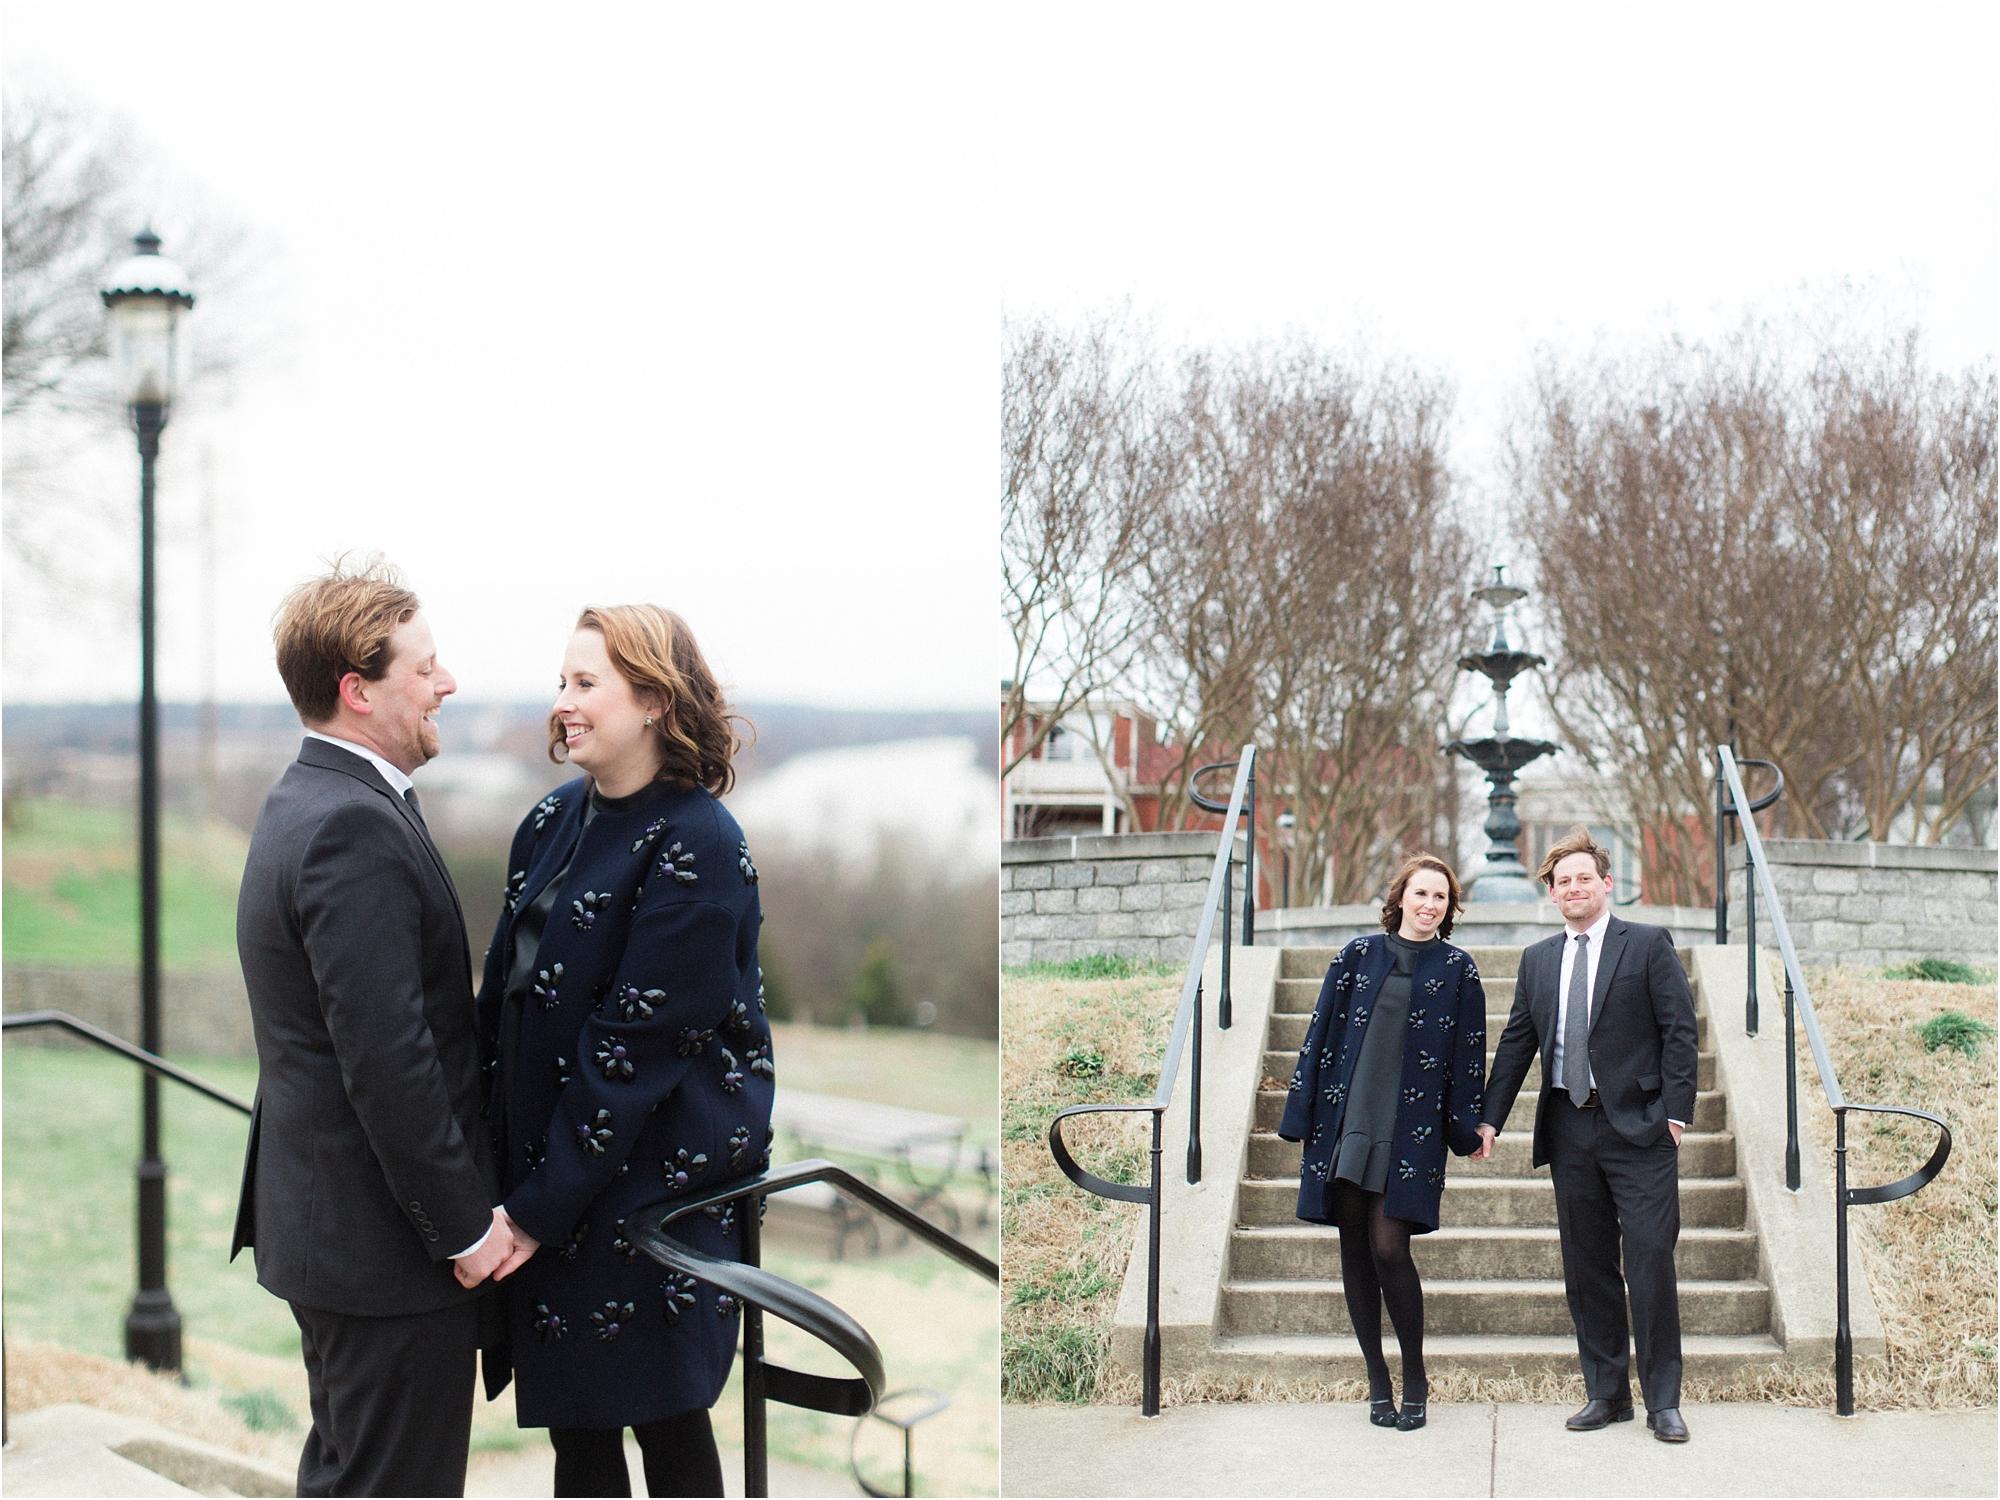 stephanie-yonce-photography-winter-libby-hill-park-virginia-engagement-photos_0002.jpg